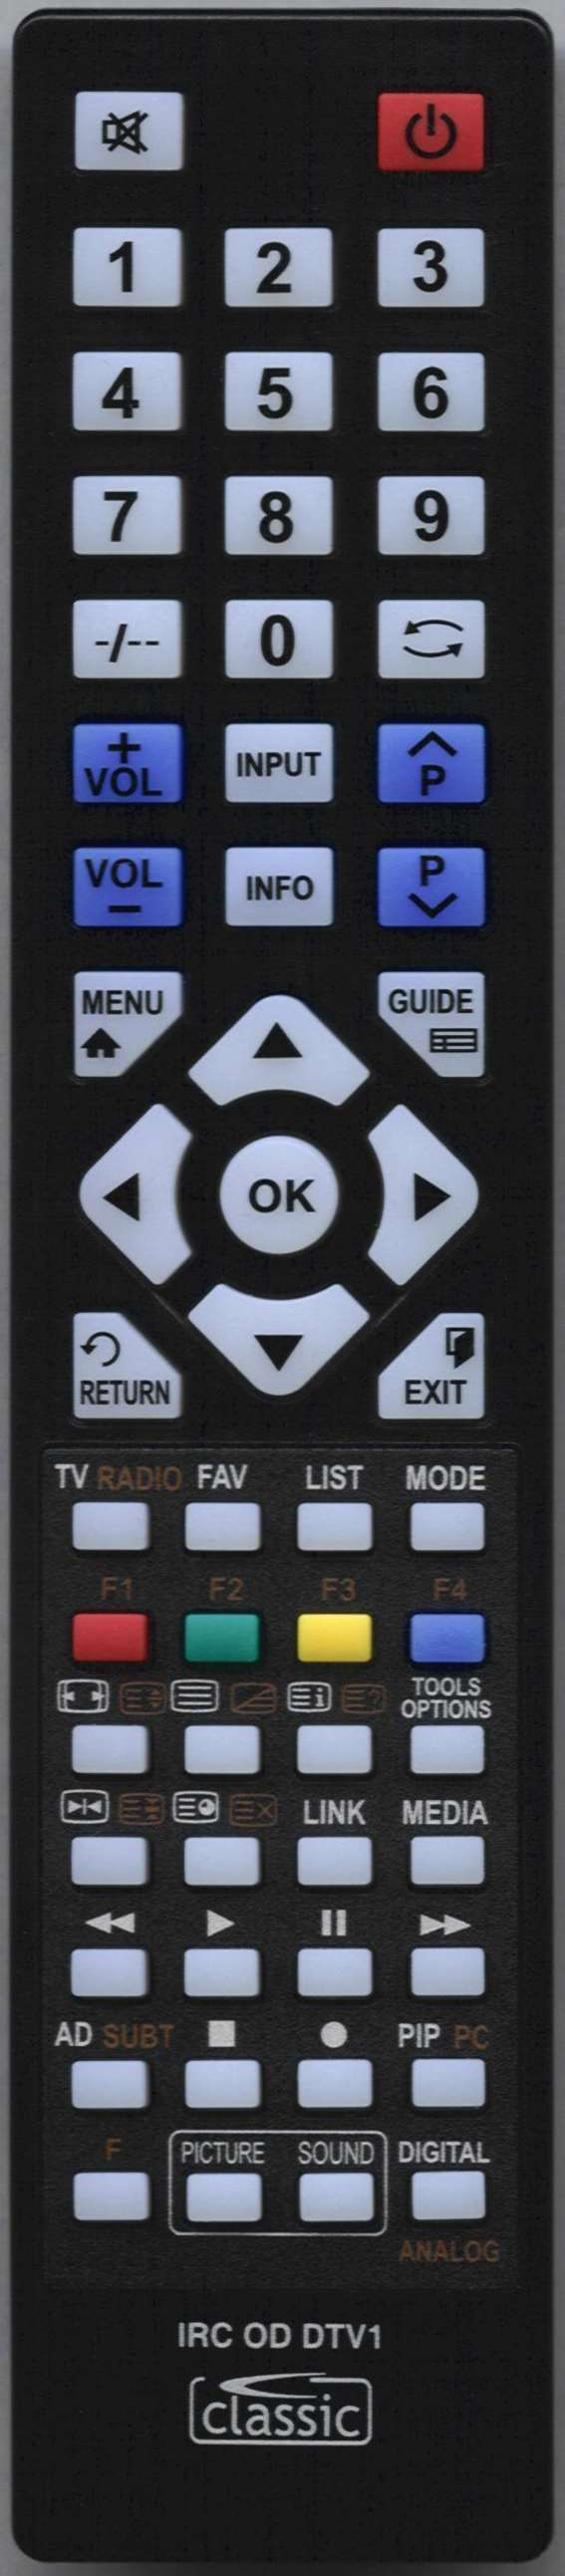 THOMSON RC300 Remote Control